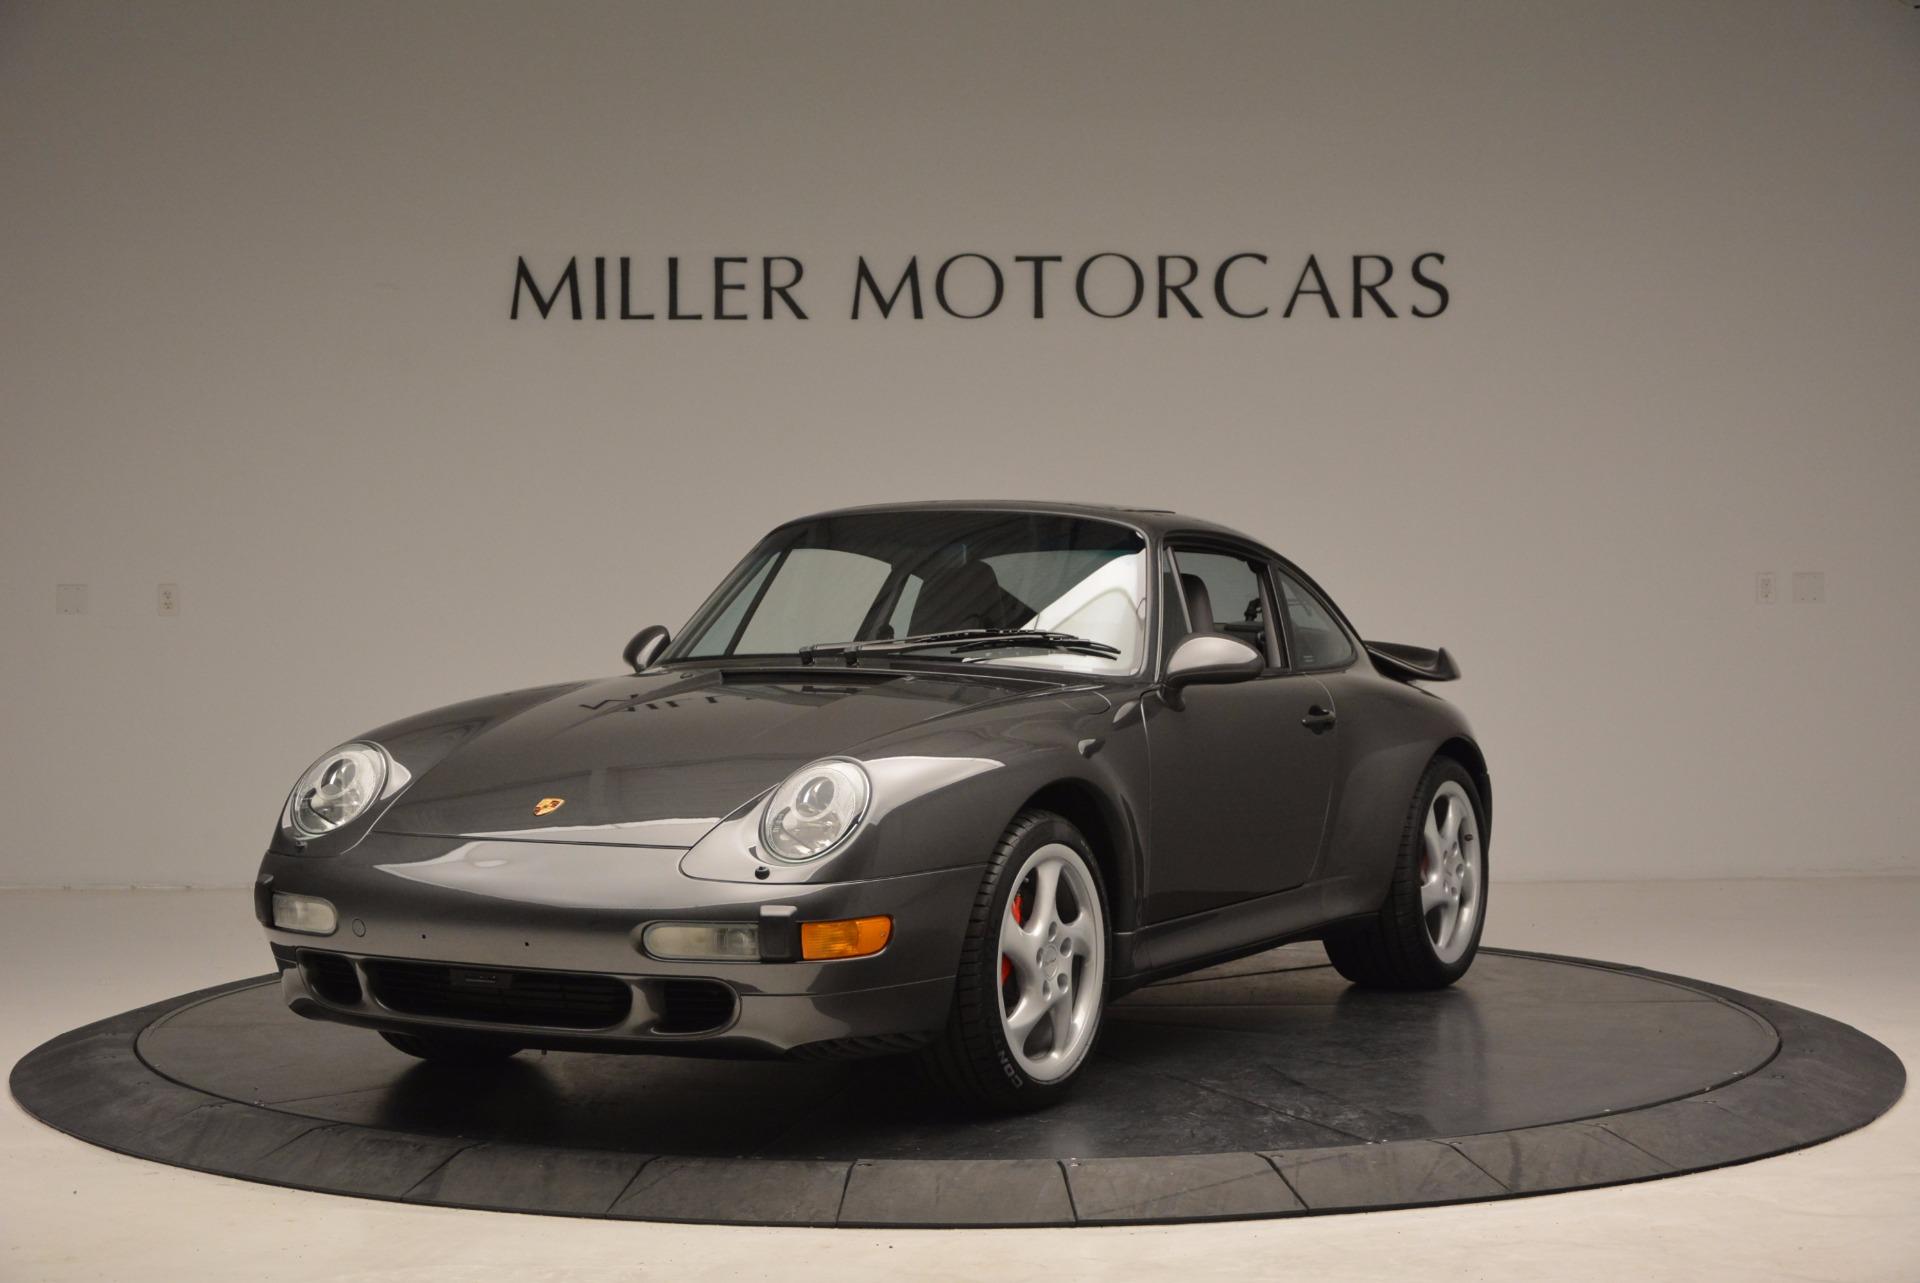 Used 1996 Porsche 911 Turbo for sale Sold at Bugatti of Greenwich in Greenwich CT 06830 1